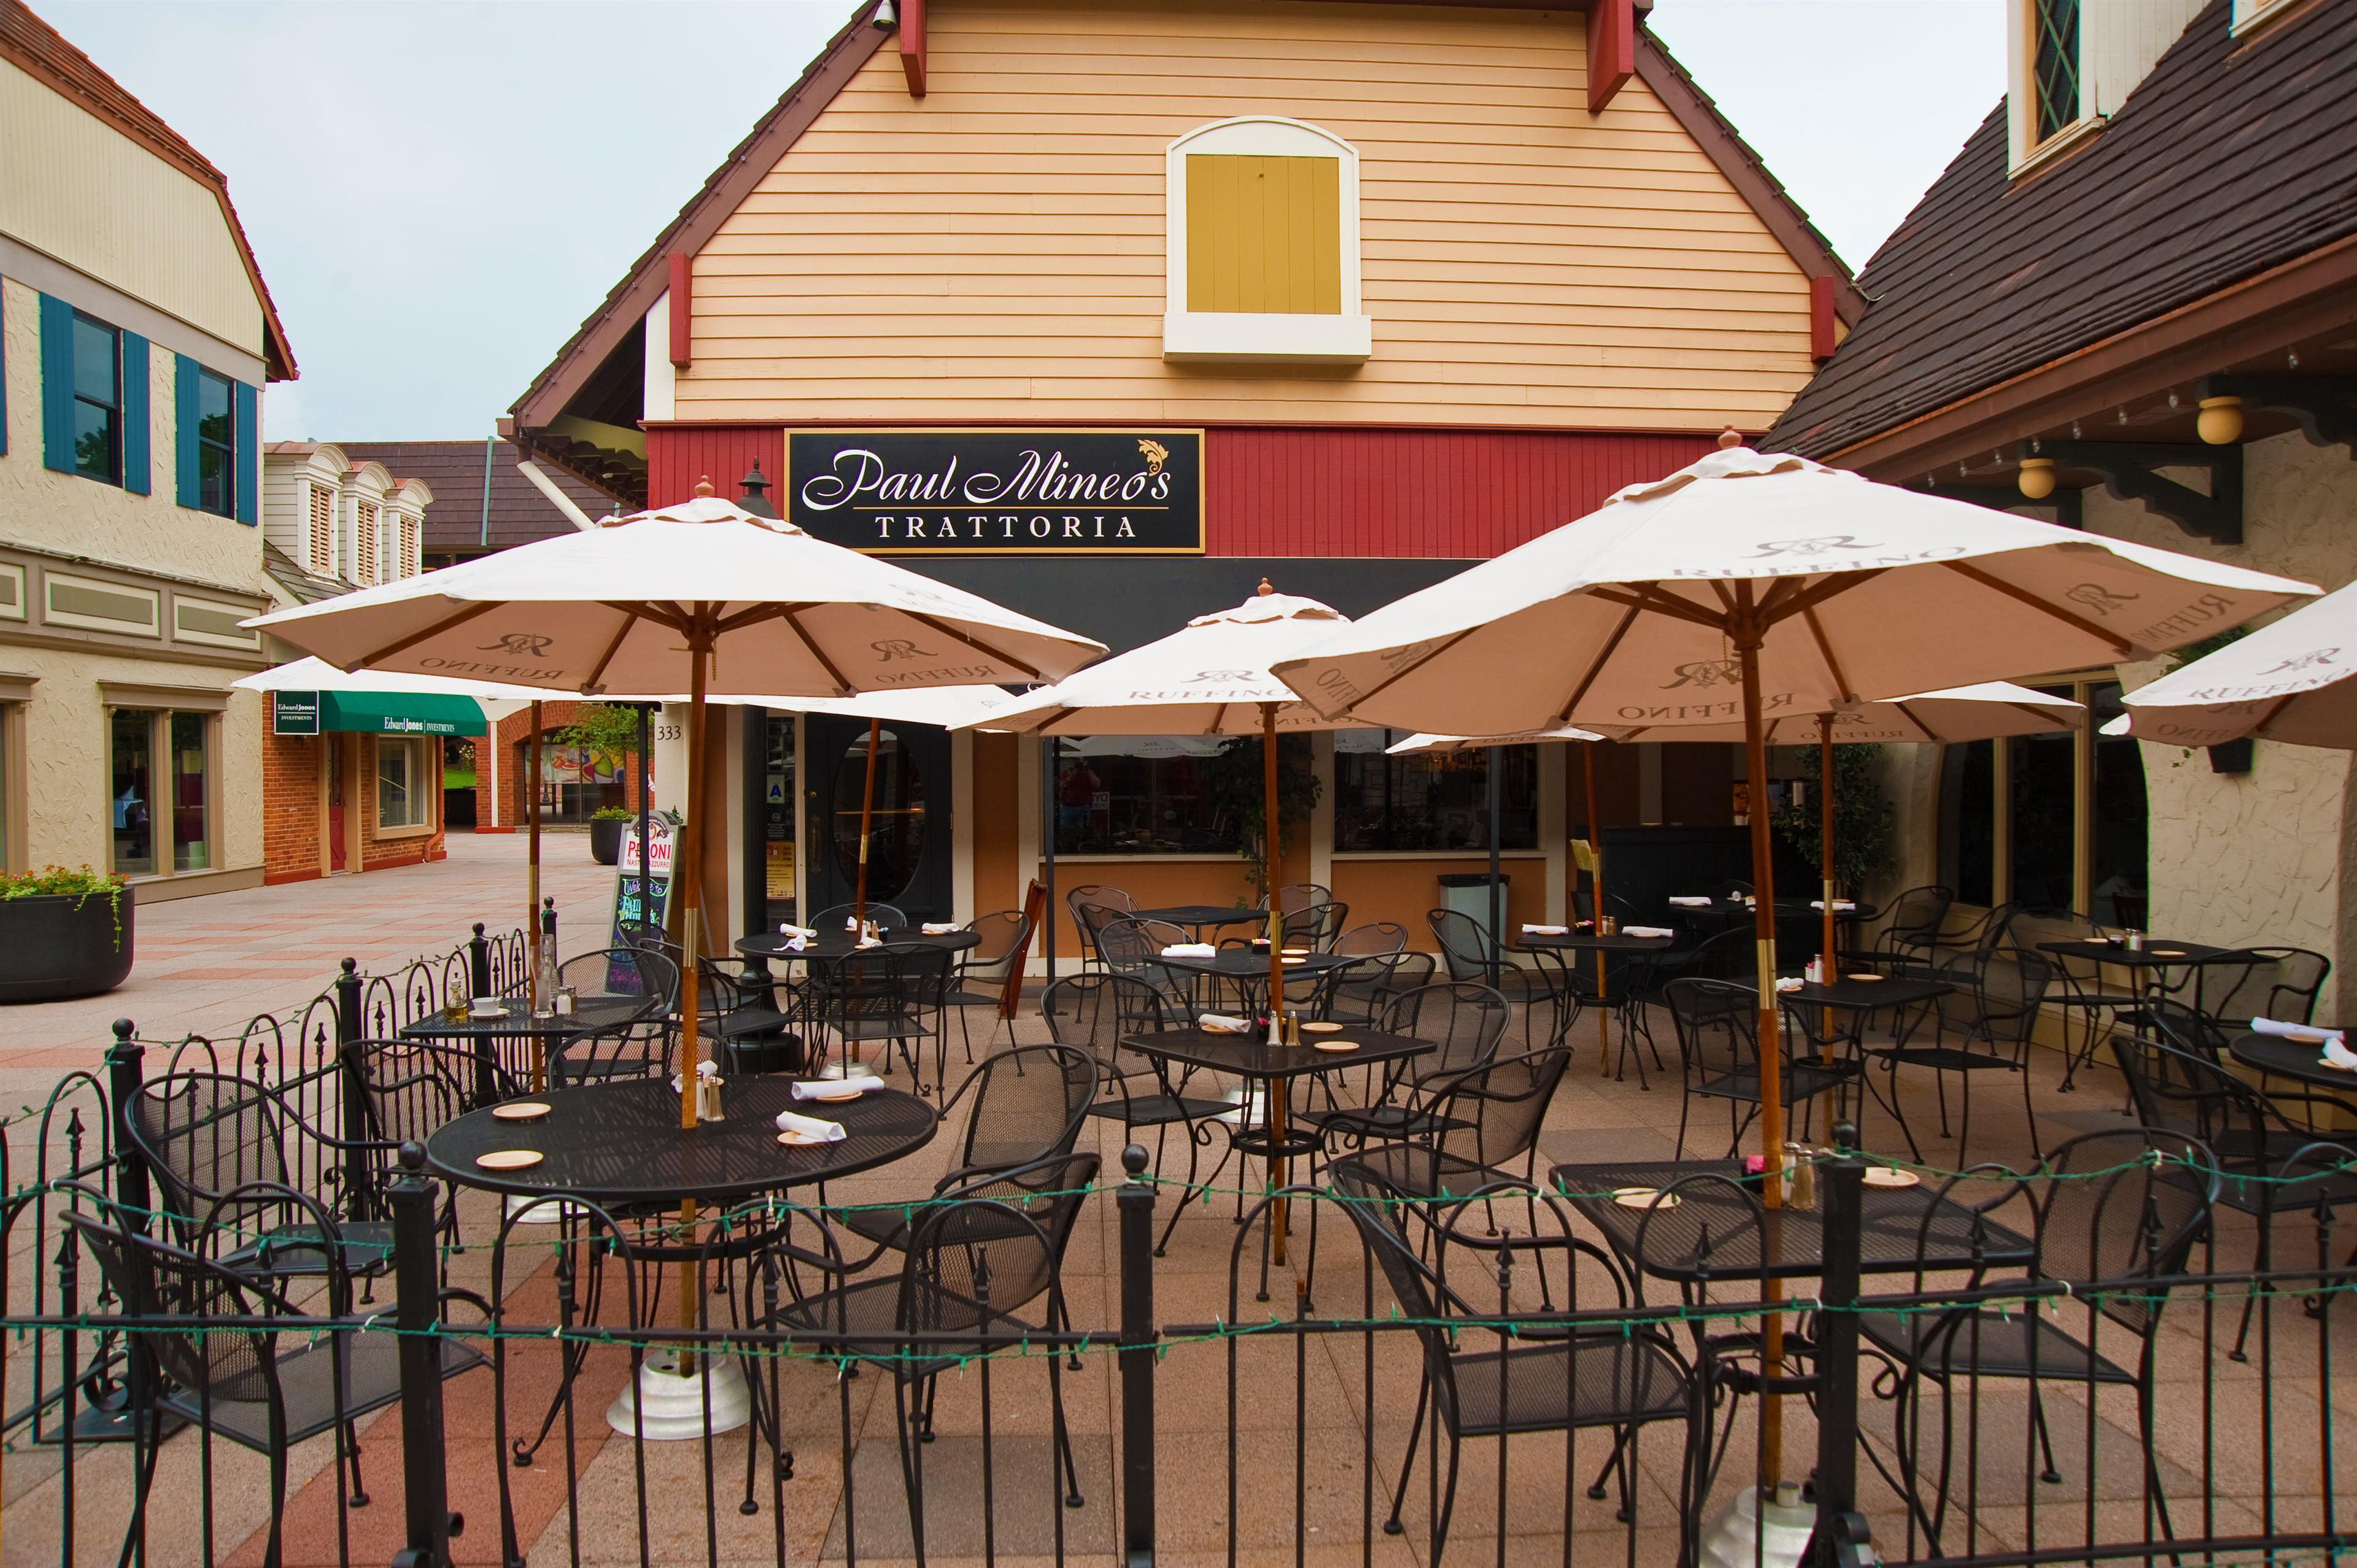 Sheraton Westport Plaza Hotel St. Louis image 12